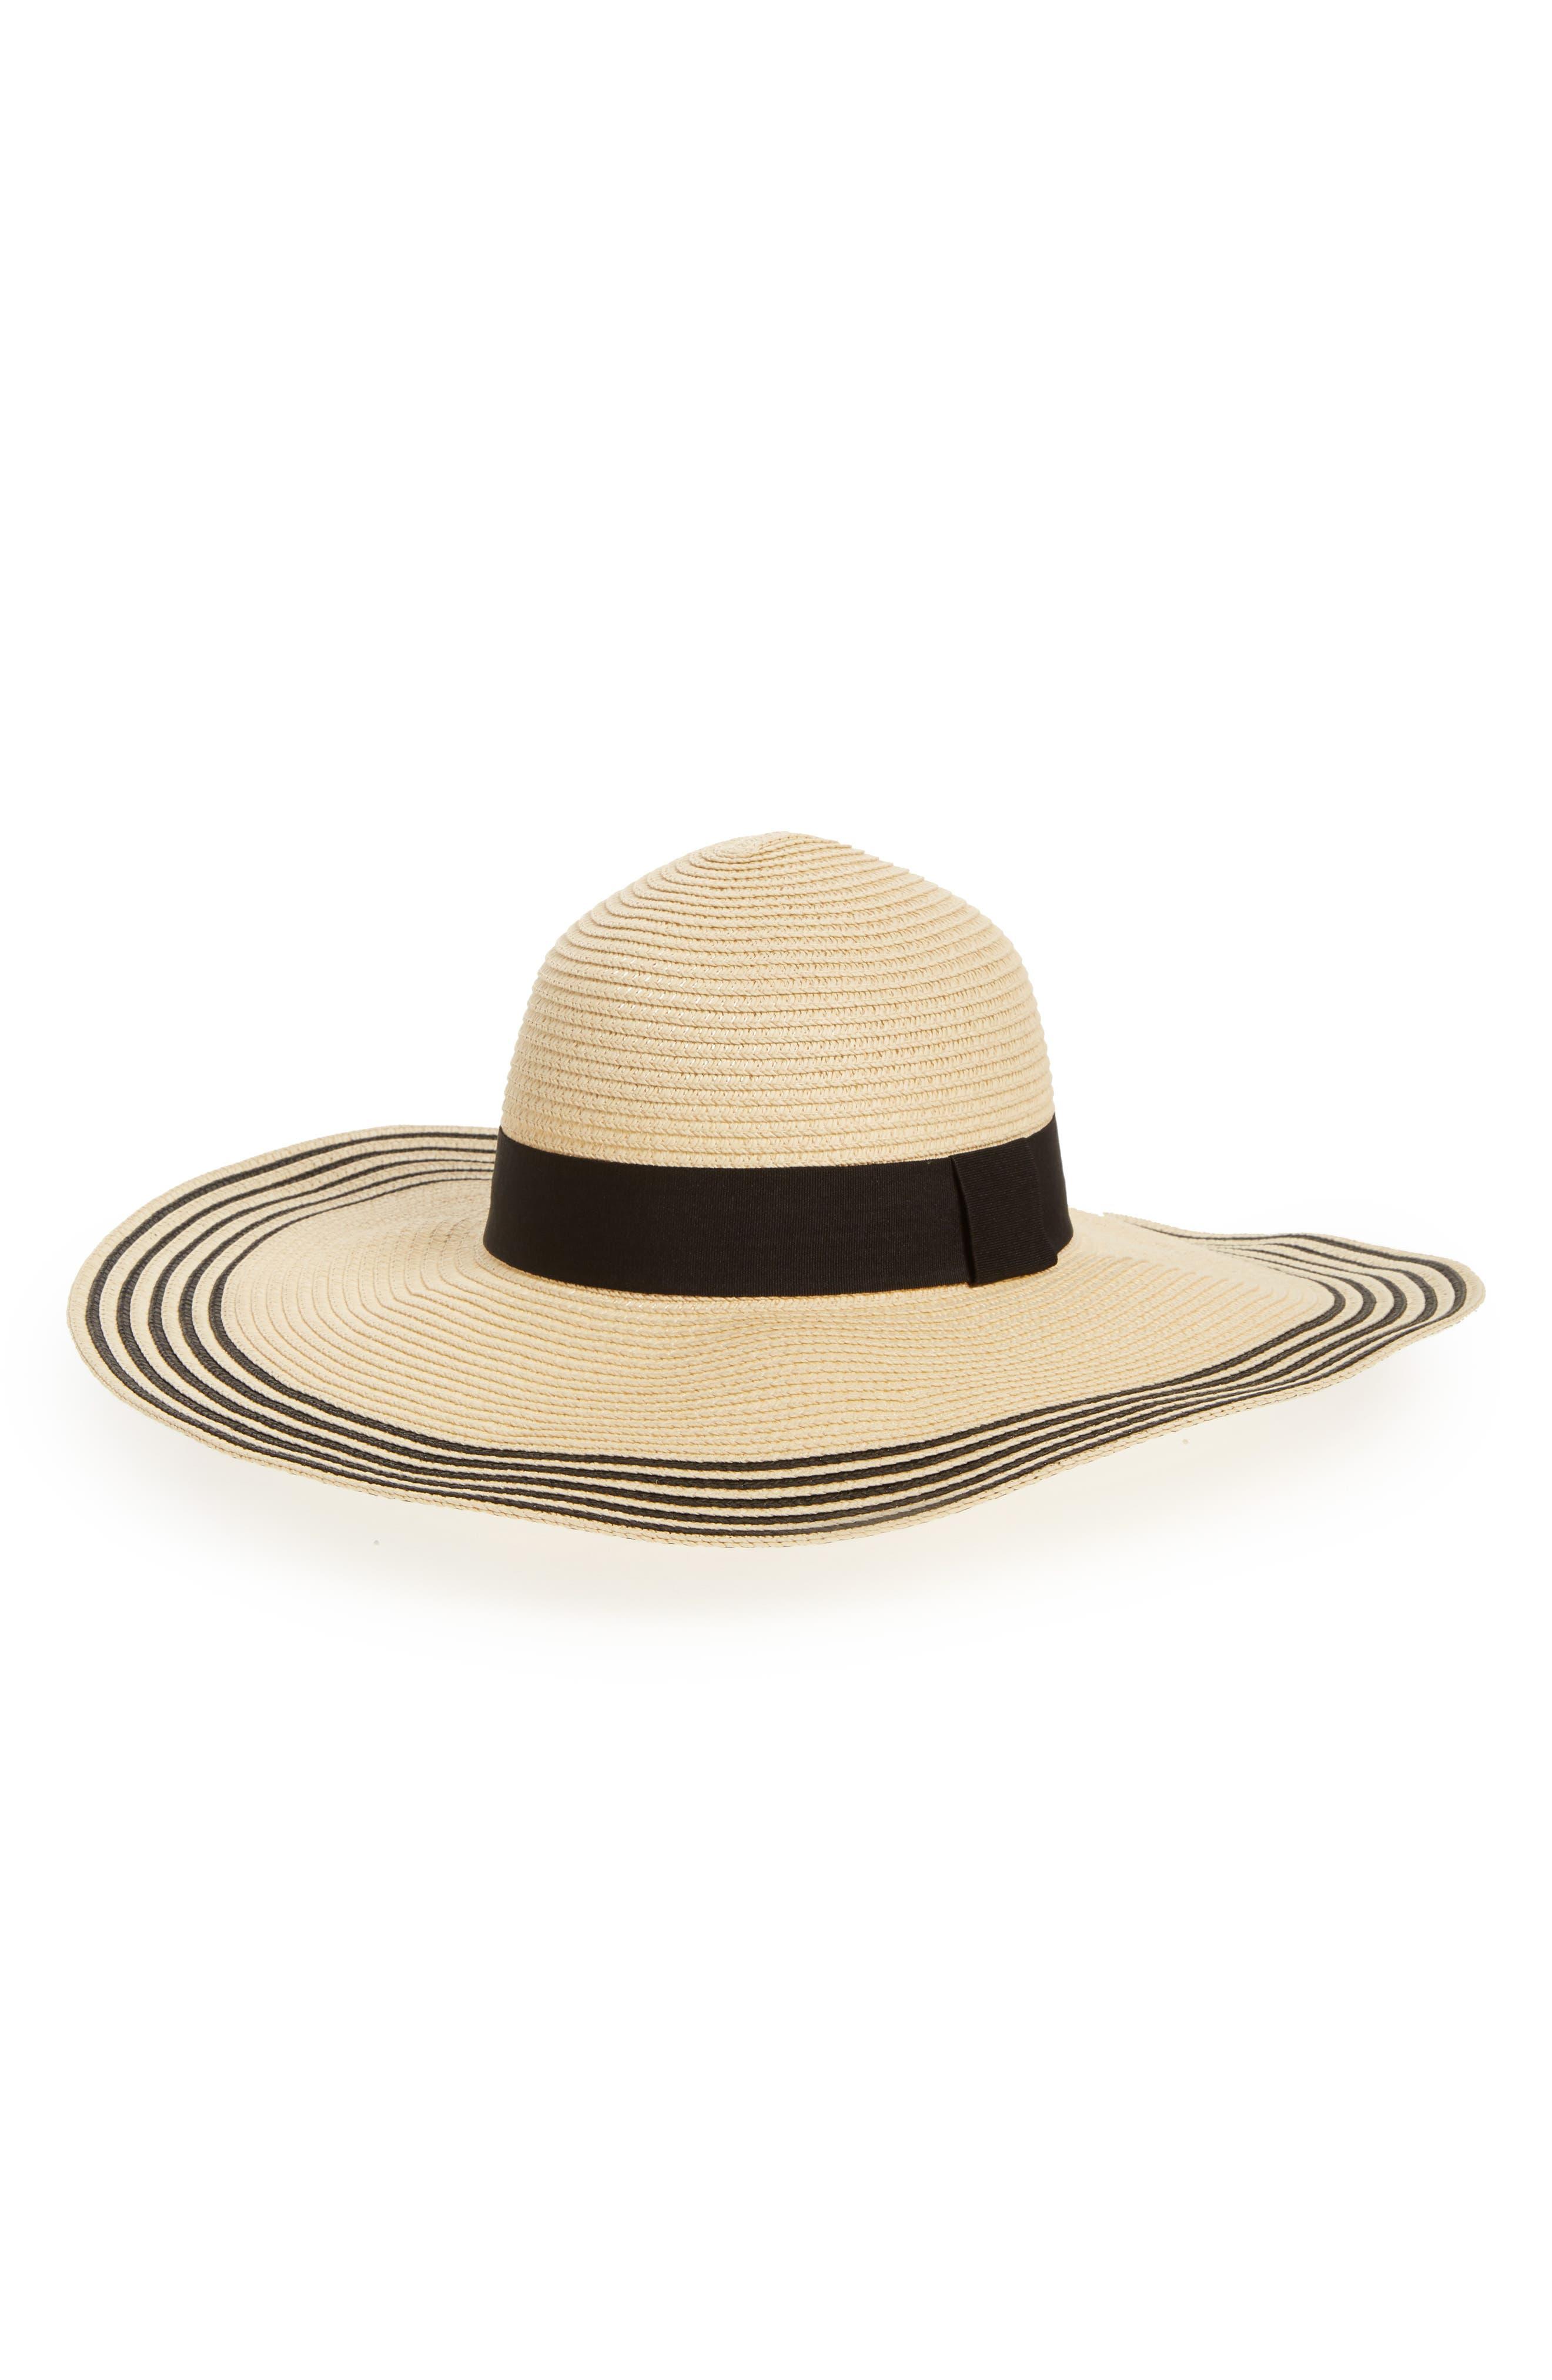 Stripe Brim Straw Hat,                             Main thumbnail 1, color,                             Natural/ Black